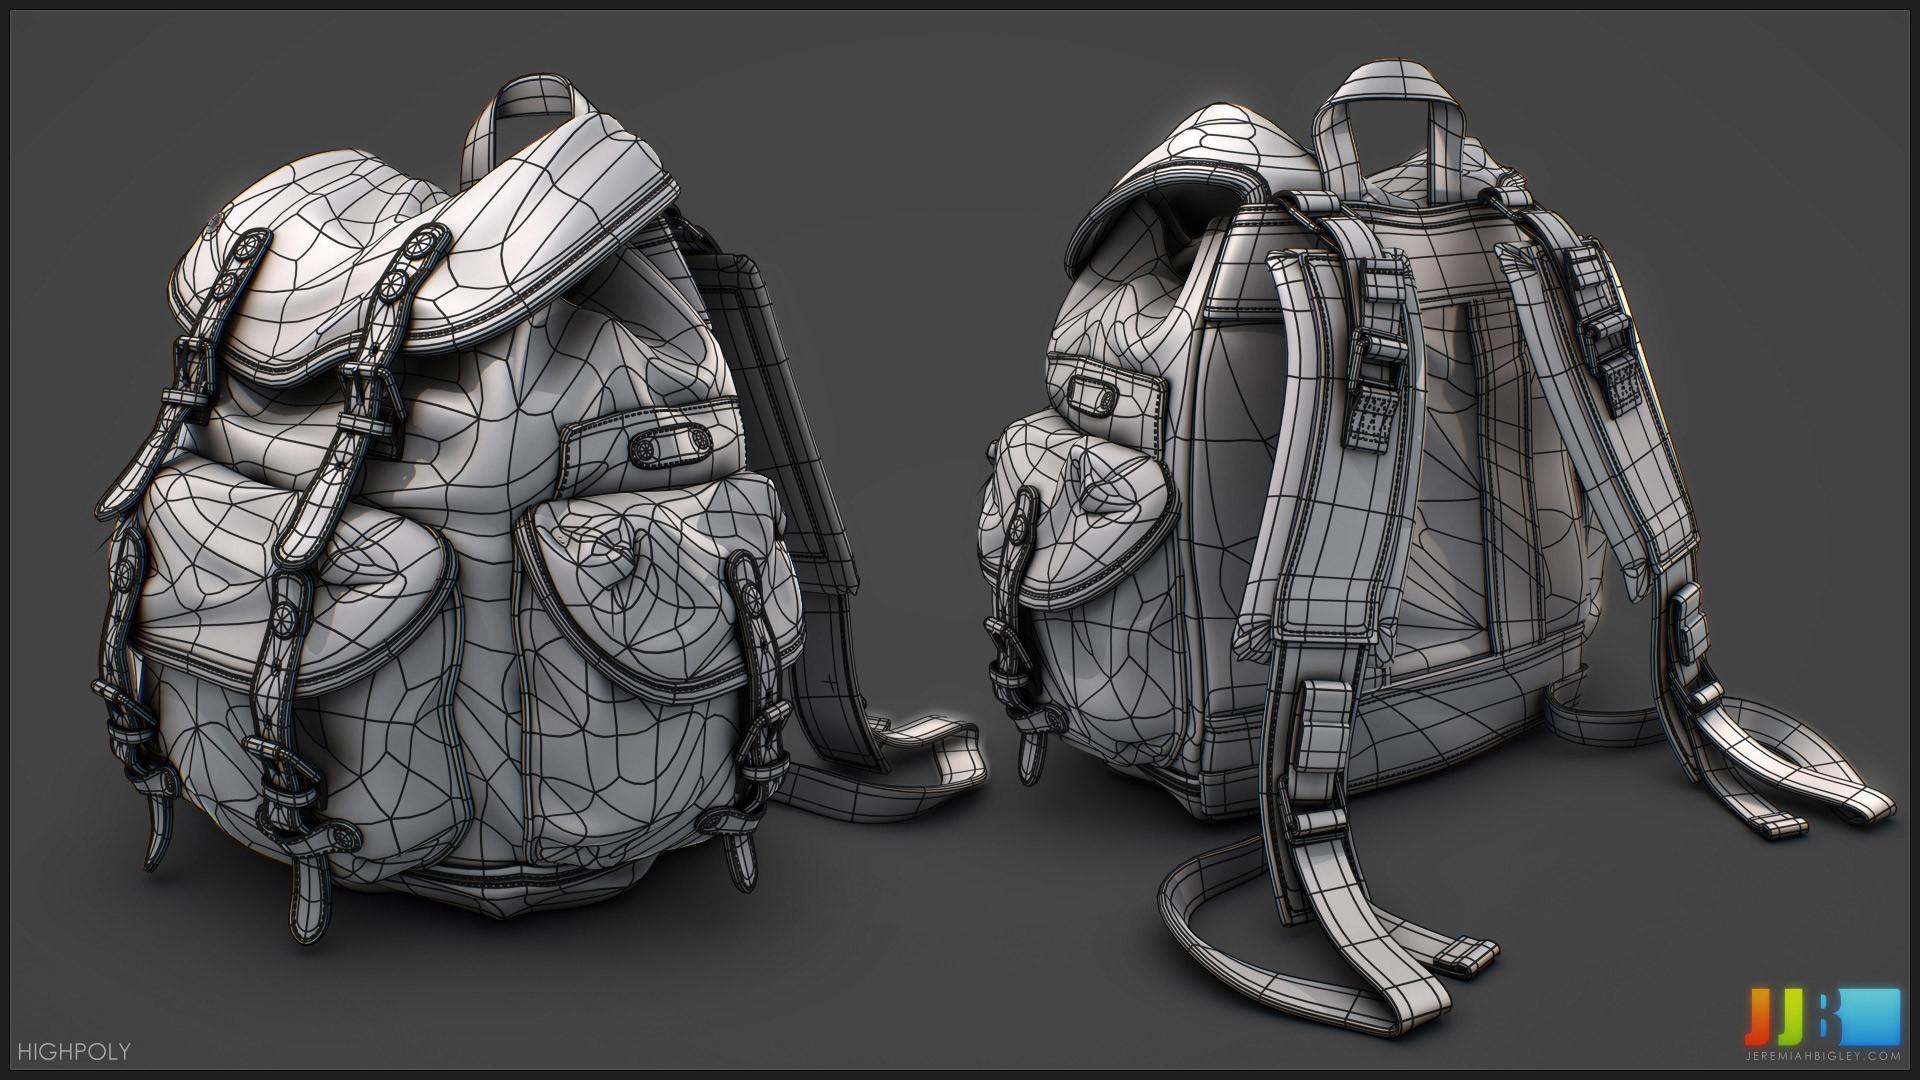 ArtStation - JJ Bigley | Backpack, Media Arts and Animation